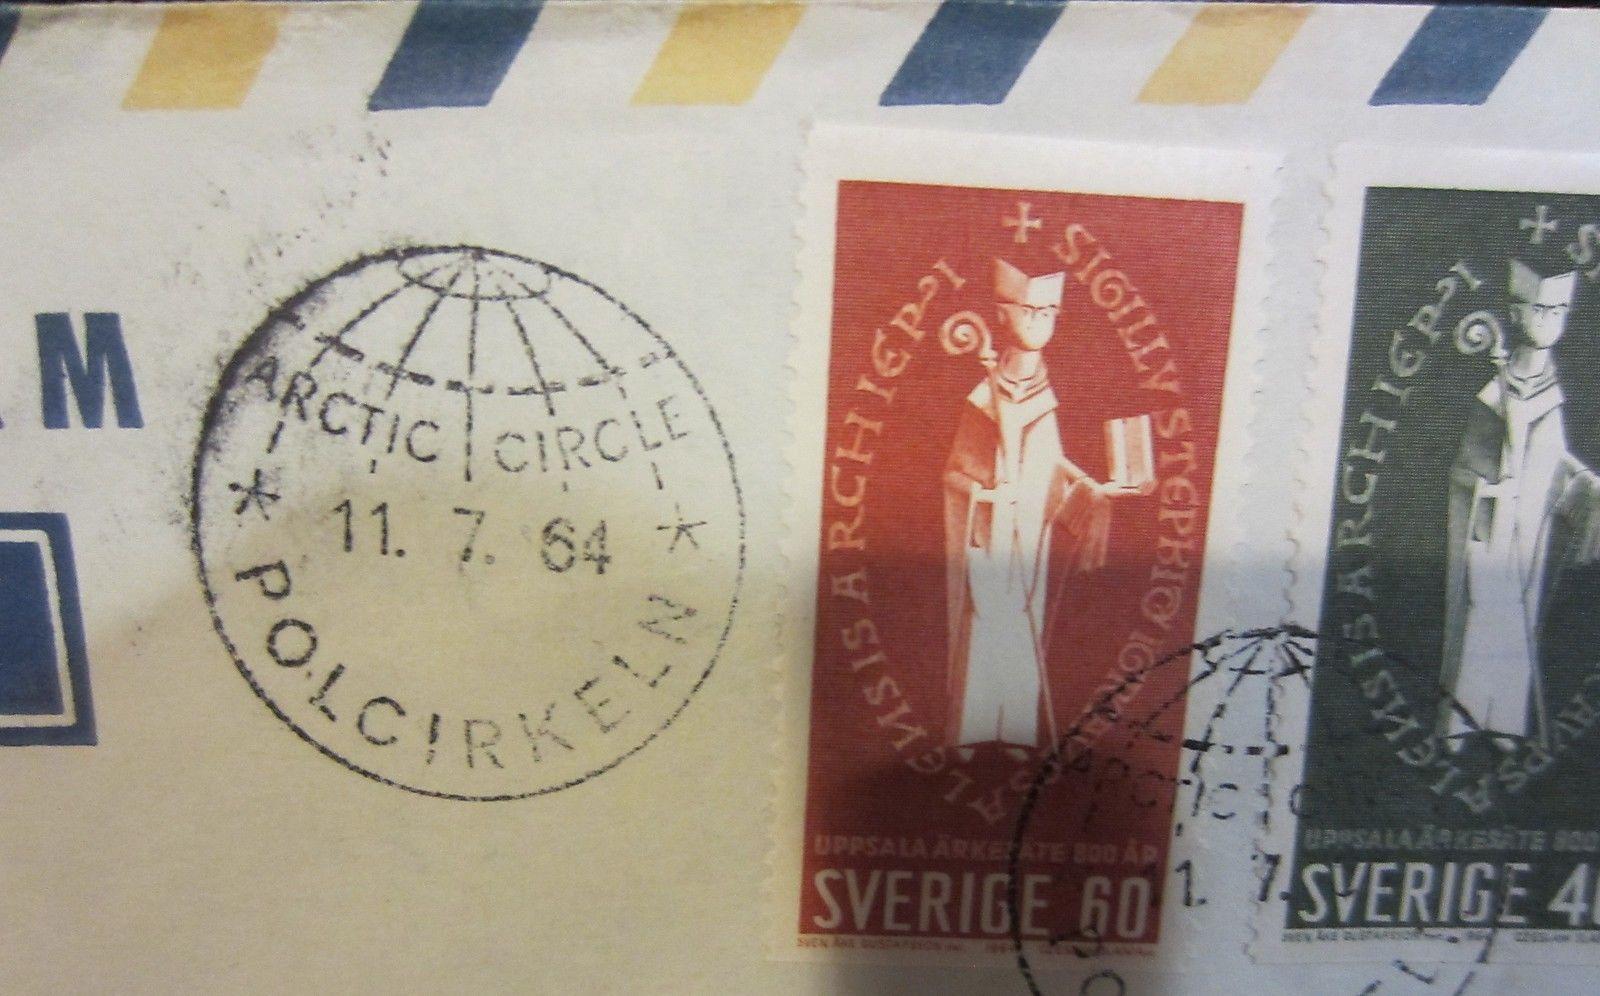 SWEDEN  ARCTIC CIRCLE CANCELLATION  POSTAGE / ENVELOPE  1964